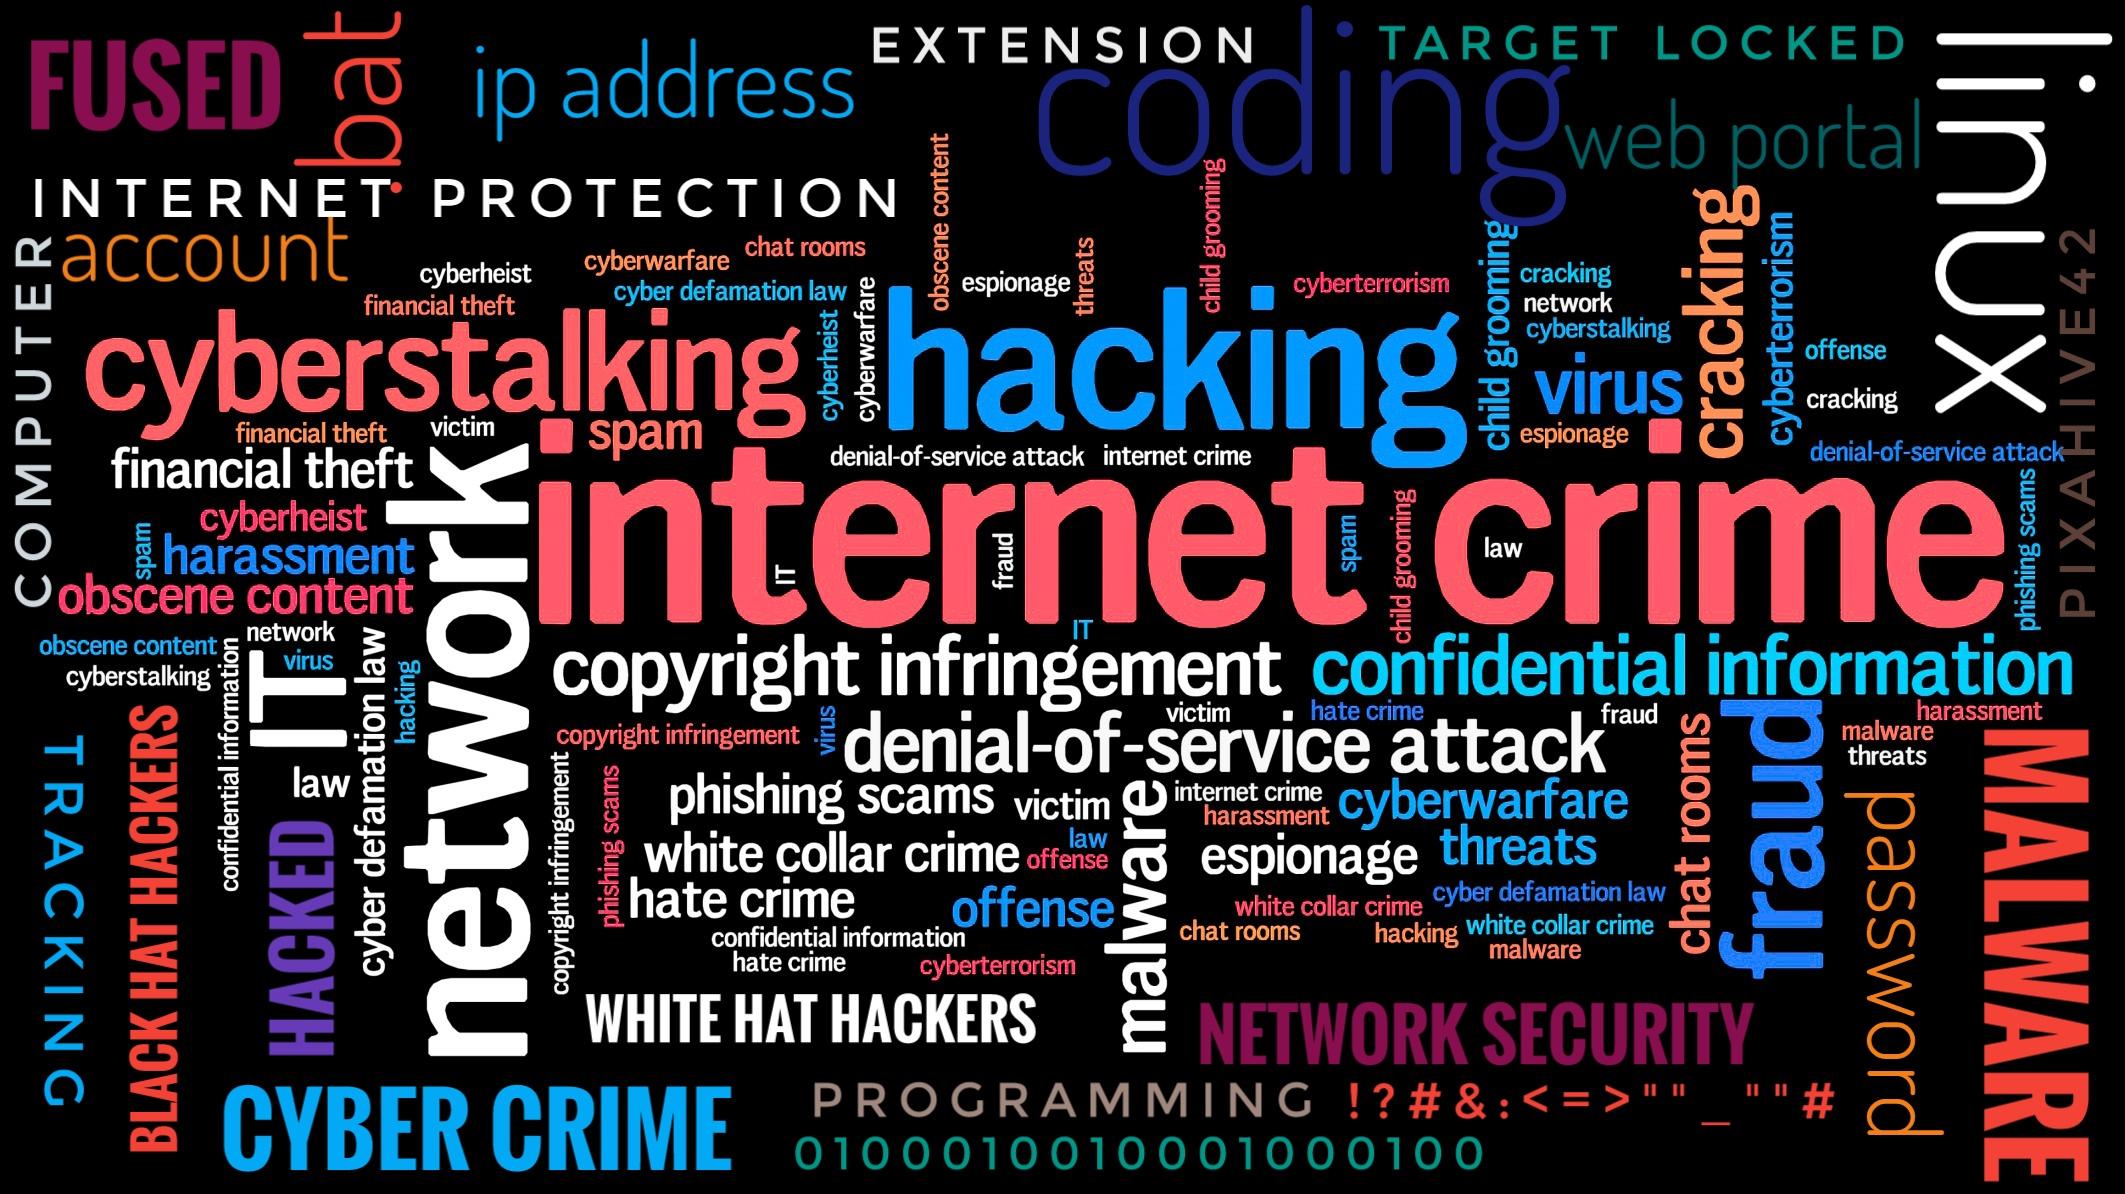 Cyber crime collage.